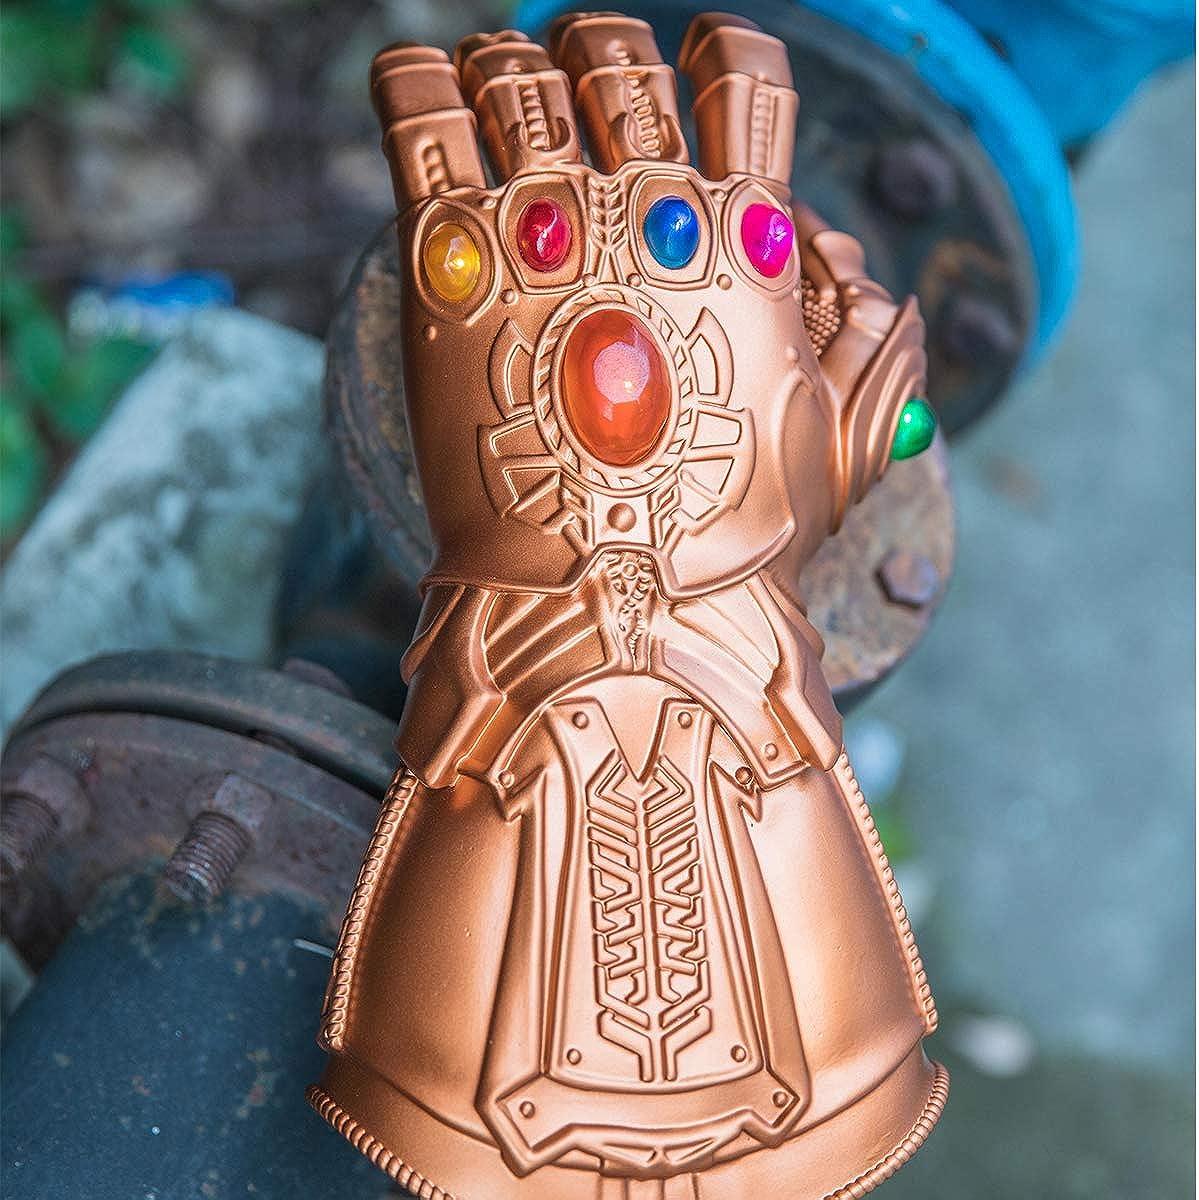 Thanos Gauntlet Infinity Gauntlet Glove Light up Movie Endgame Cosplay Costume Props for Men